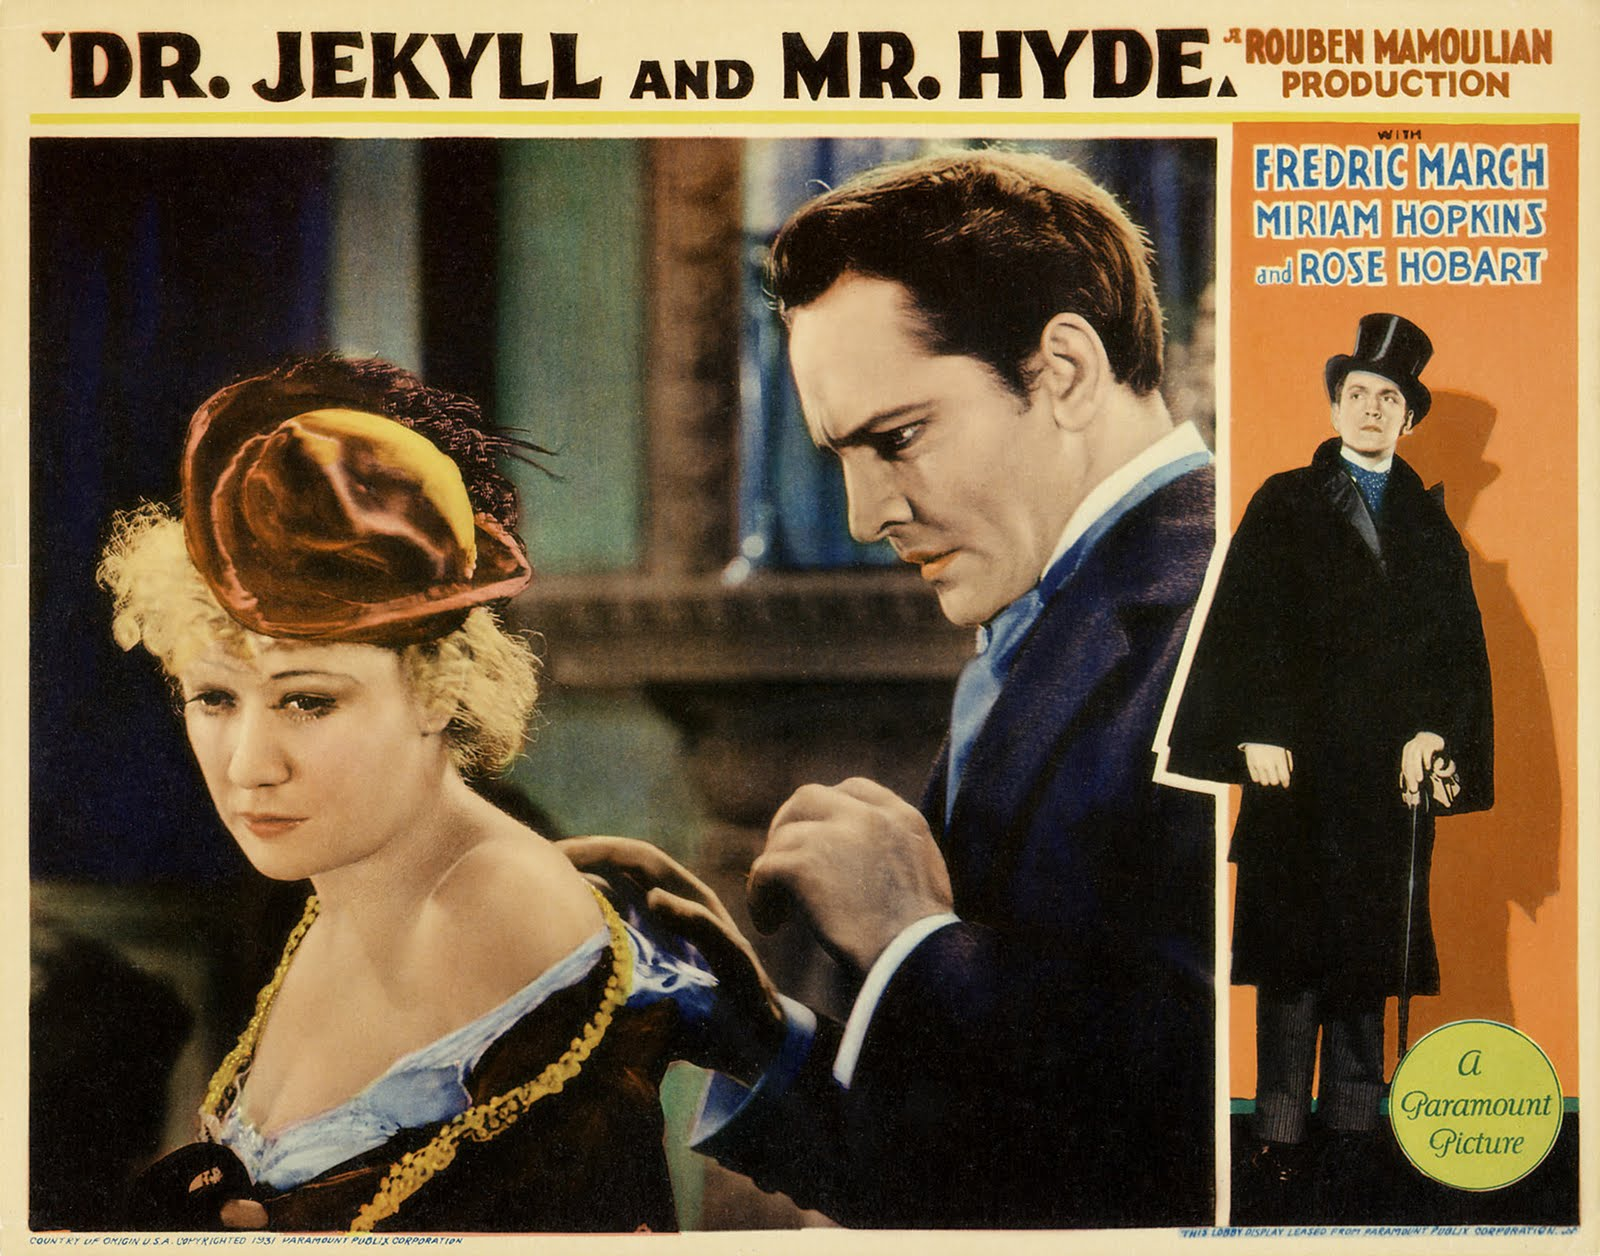 fredric-march-miriam-hopkins-dr-jekyll-and-mr-hyde-lobby-card-2